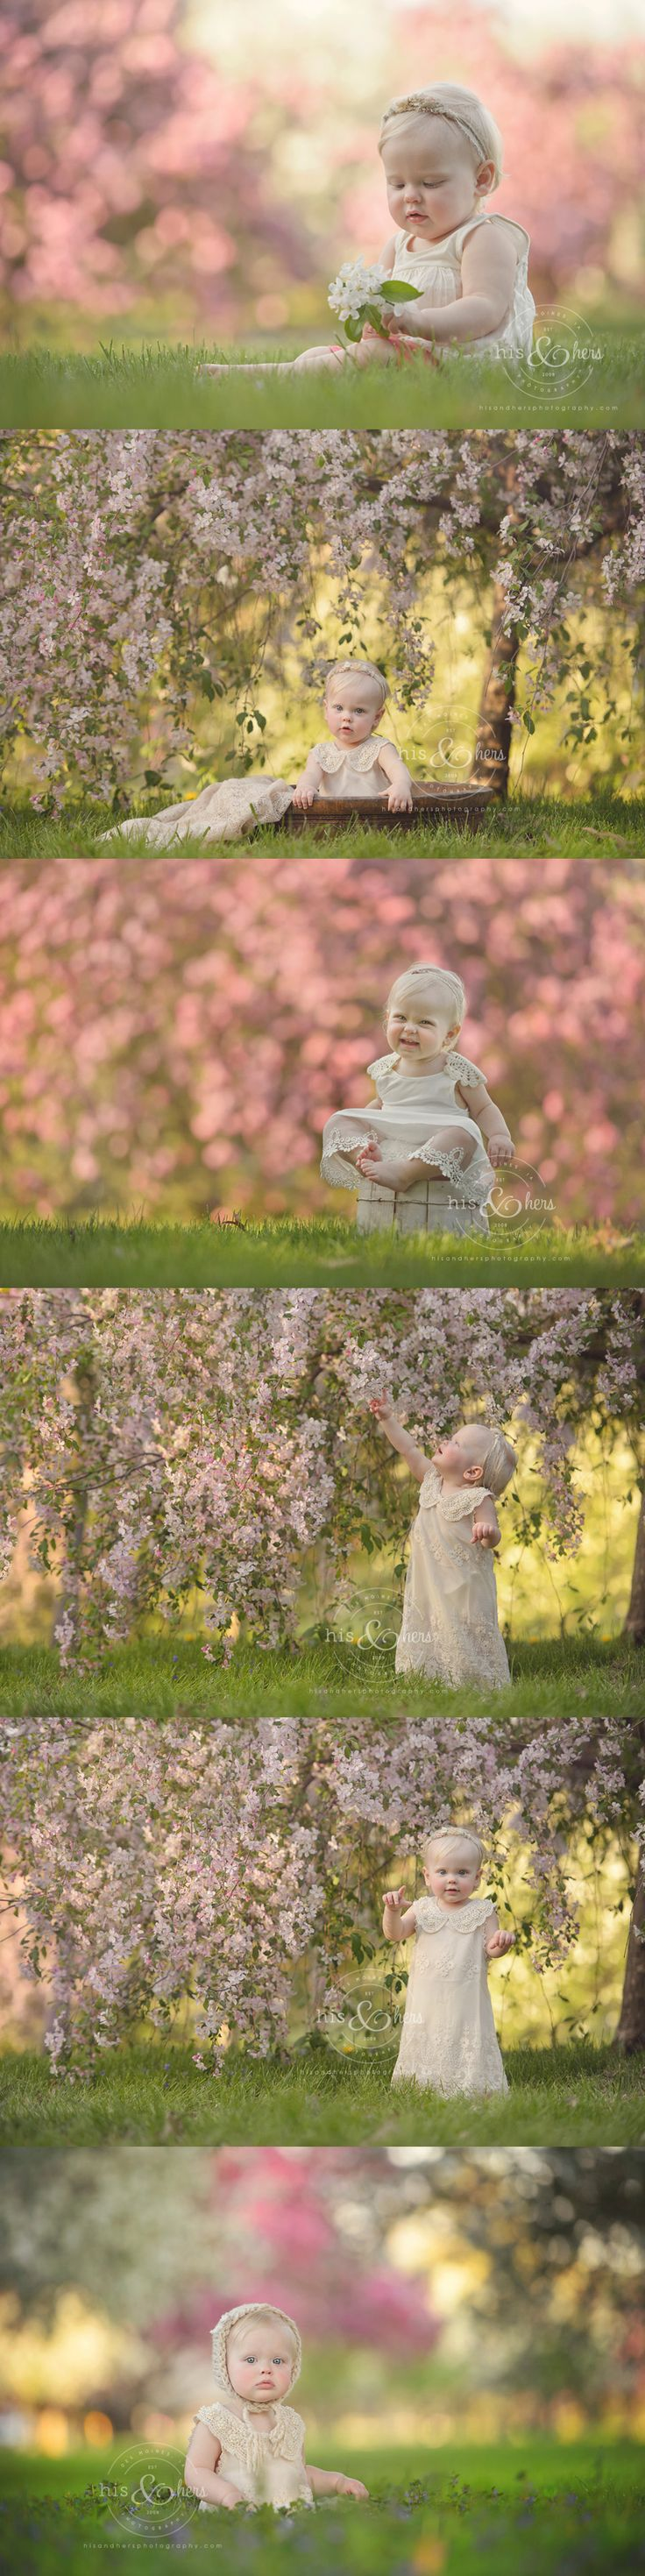 Decorating Ideas > Des Moines Iowa Baby Photographer Child Photographer 1  ~ 220223_Birthday Party Ideas Des Moines